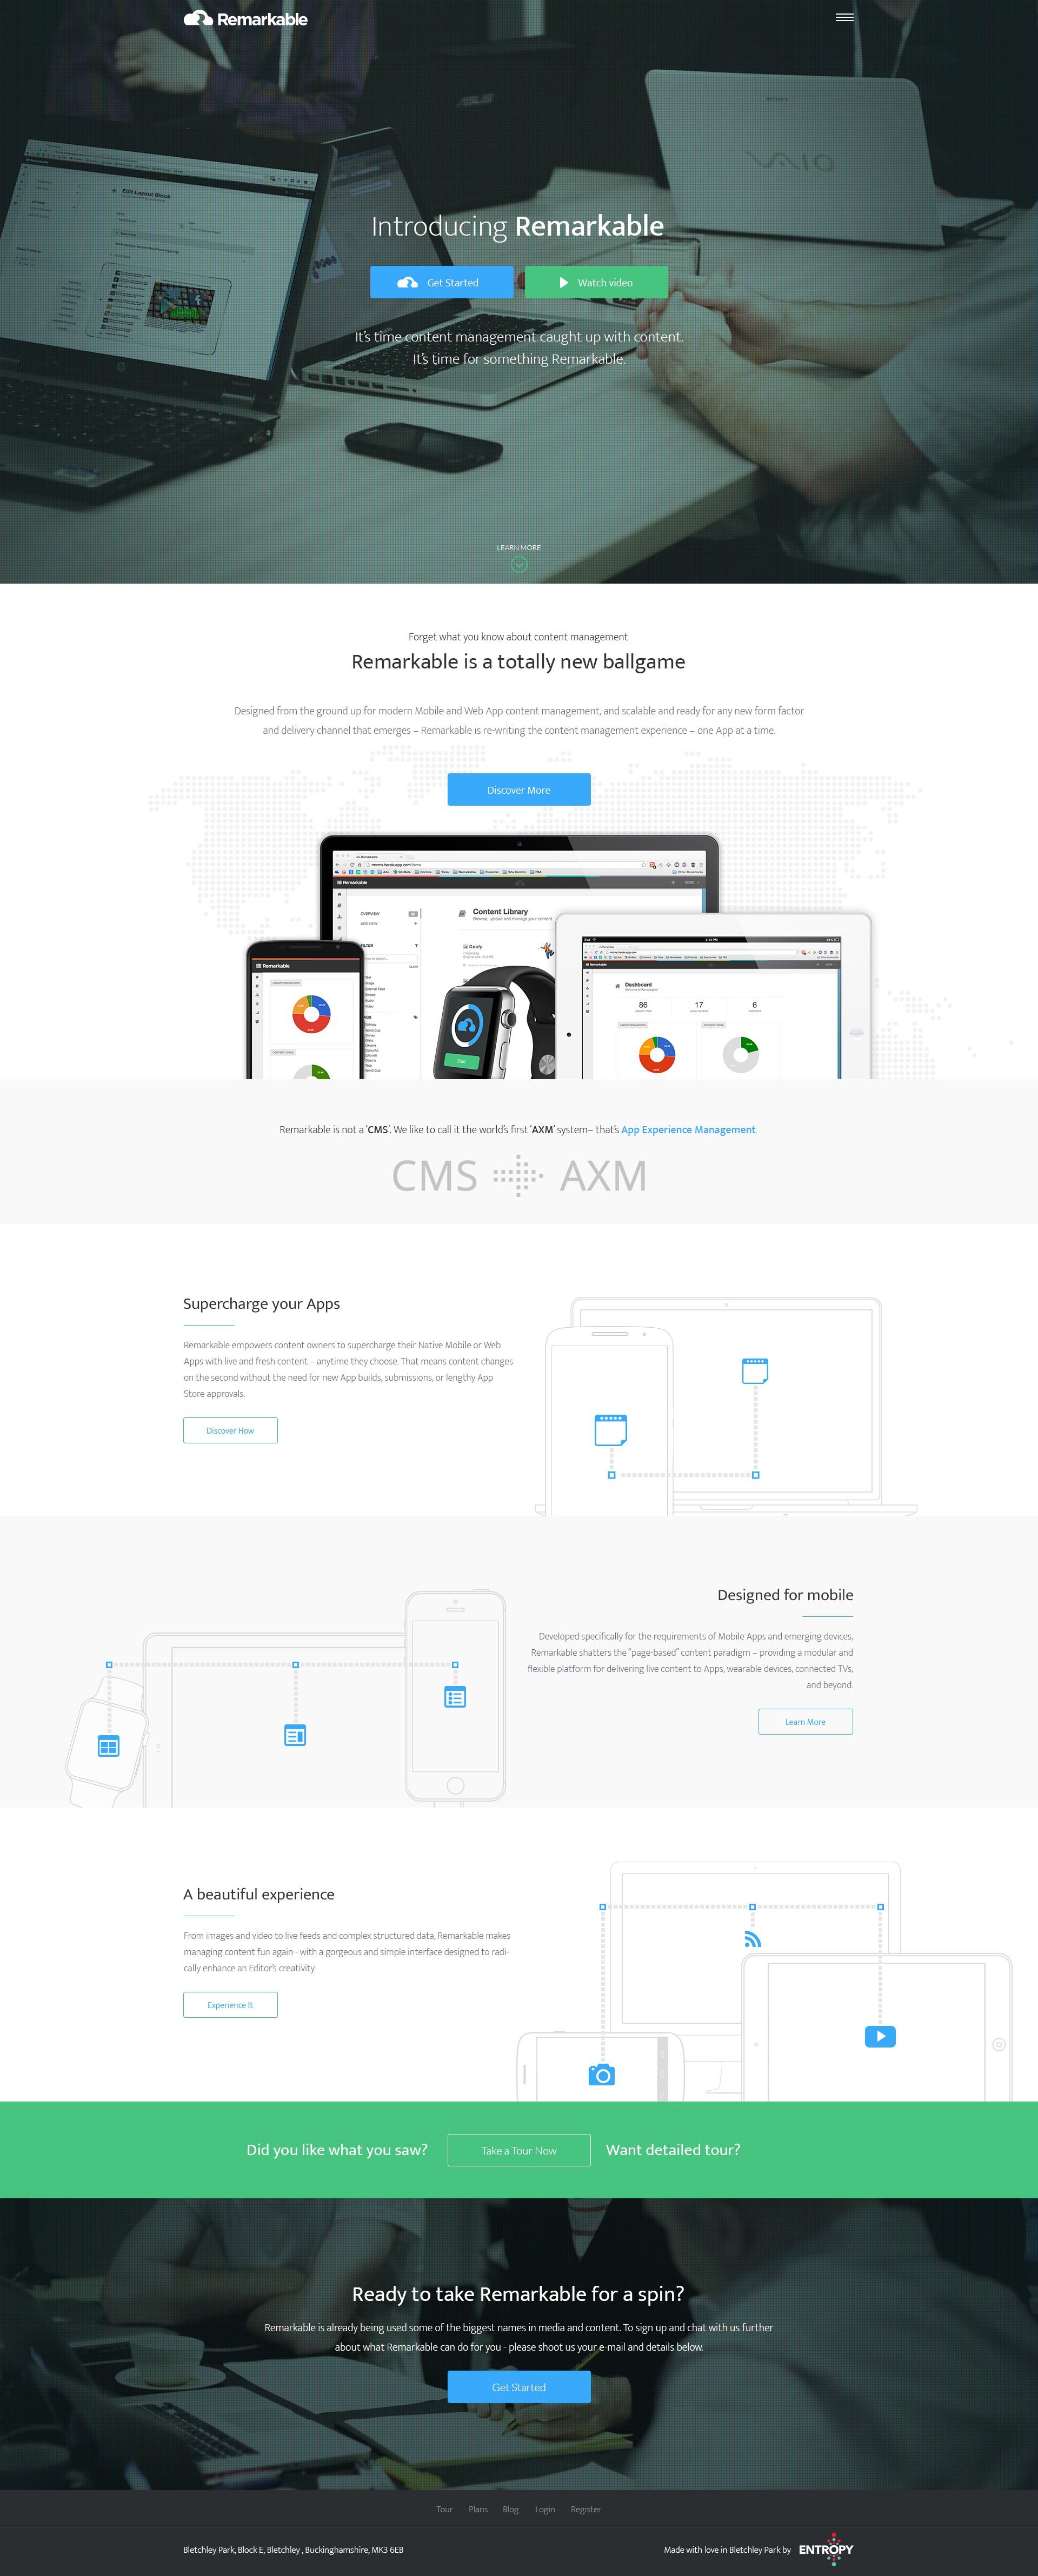 Remarkable CMS Web App Needs a Remarkable Design!